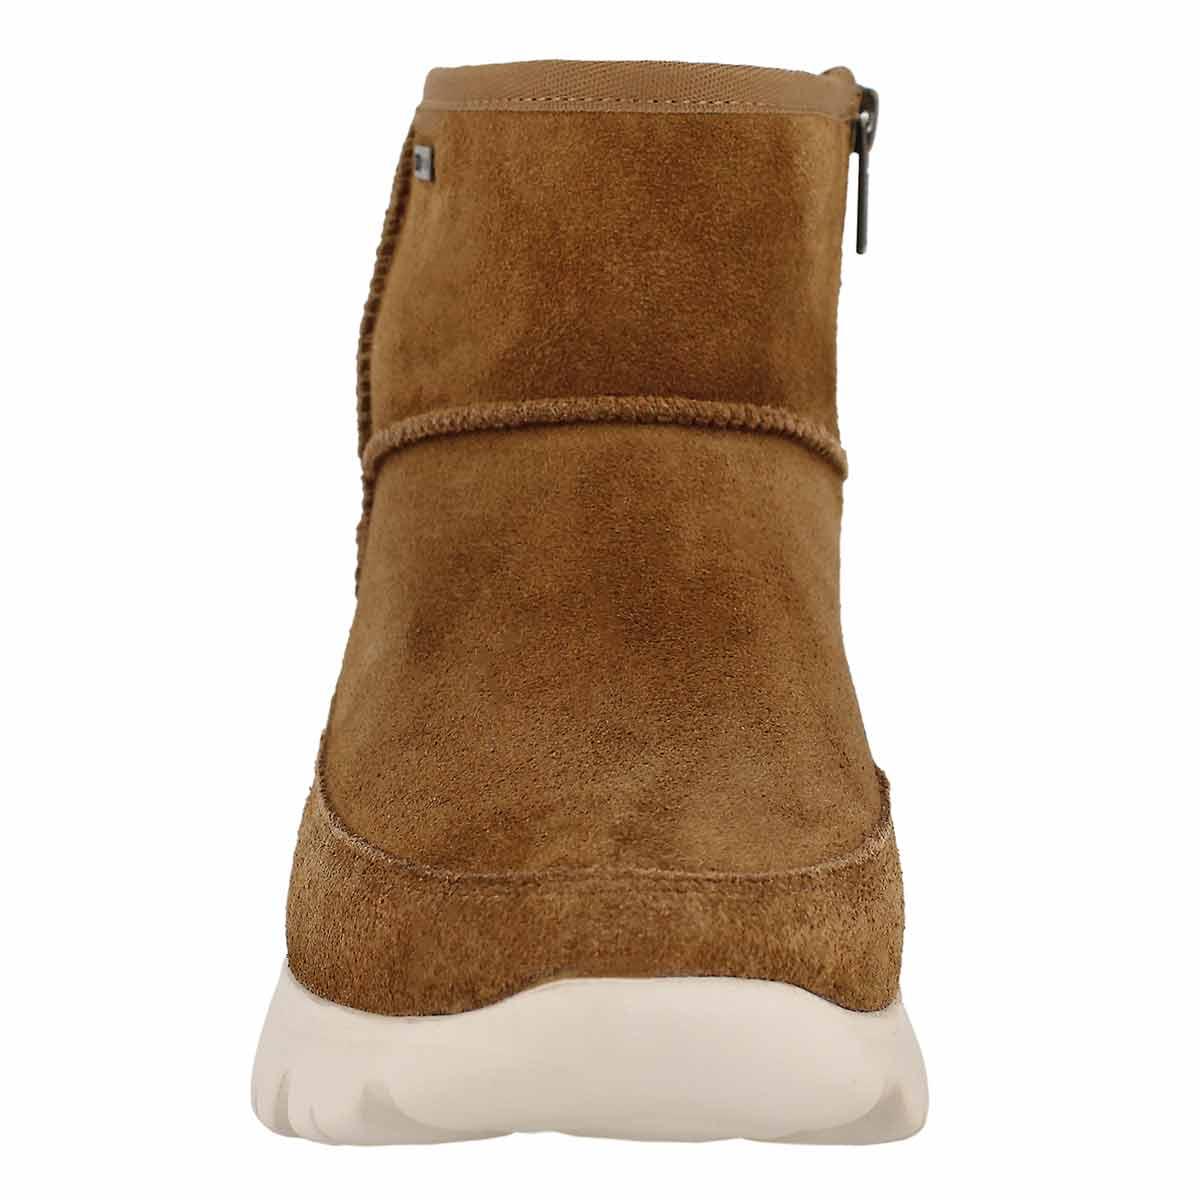 Lds Palomar chestnut wtpf winter boot